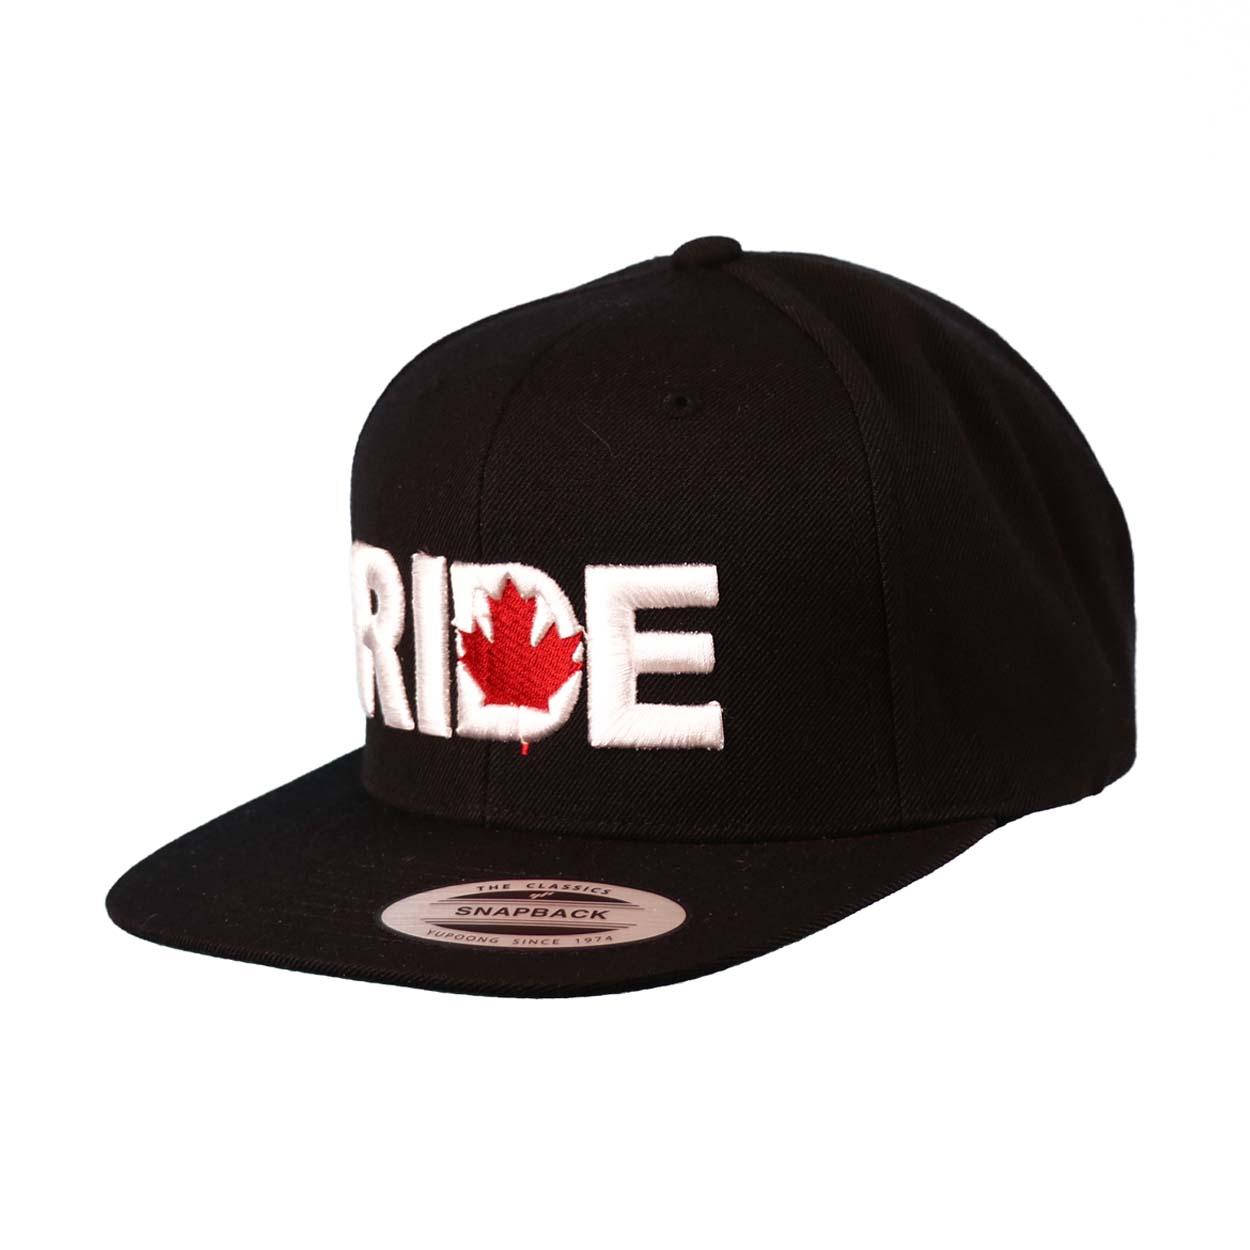 Ride Canada Classic Embroidered  Snapback Flat Brim Hat Black/White